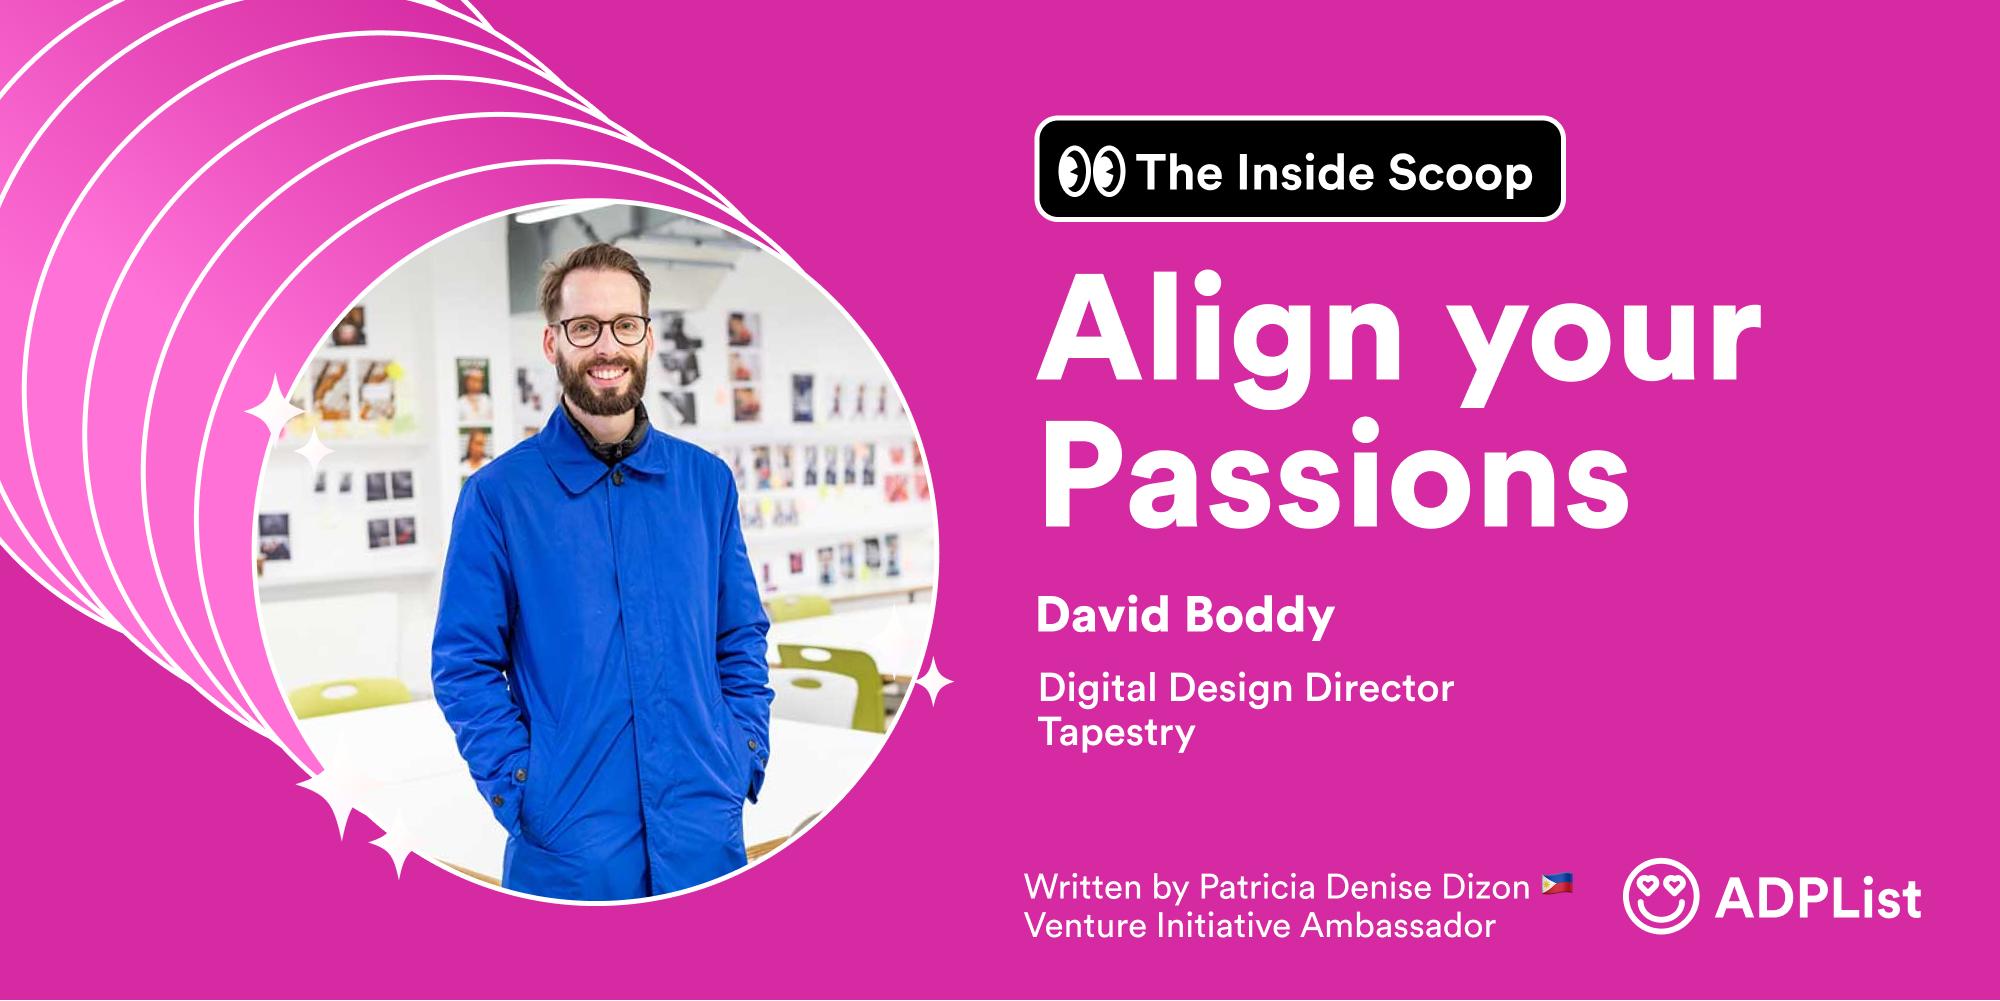 Inside Scoop - David Boddy